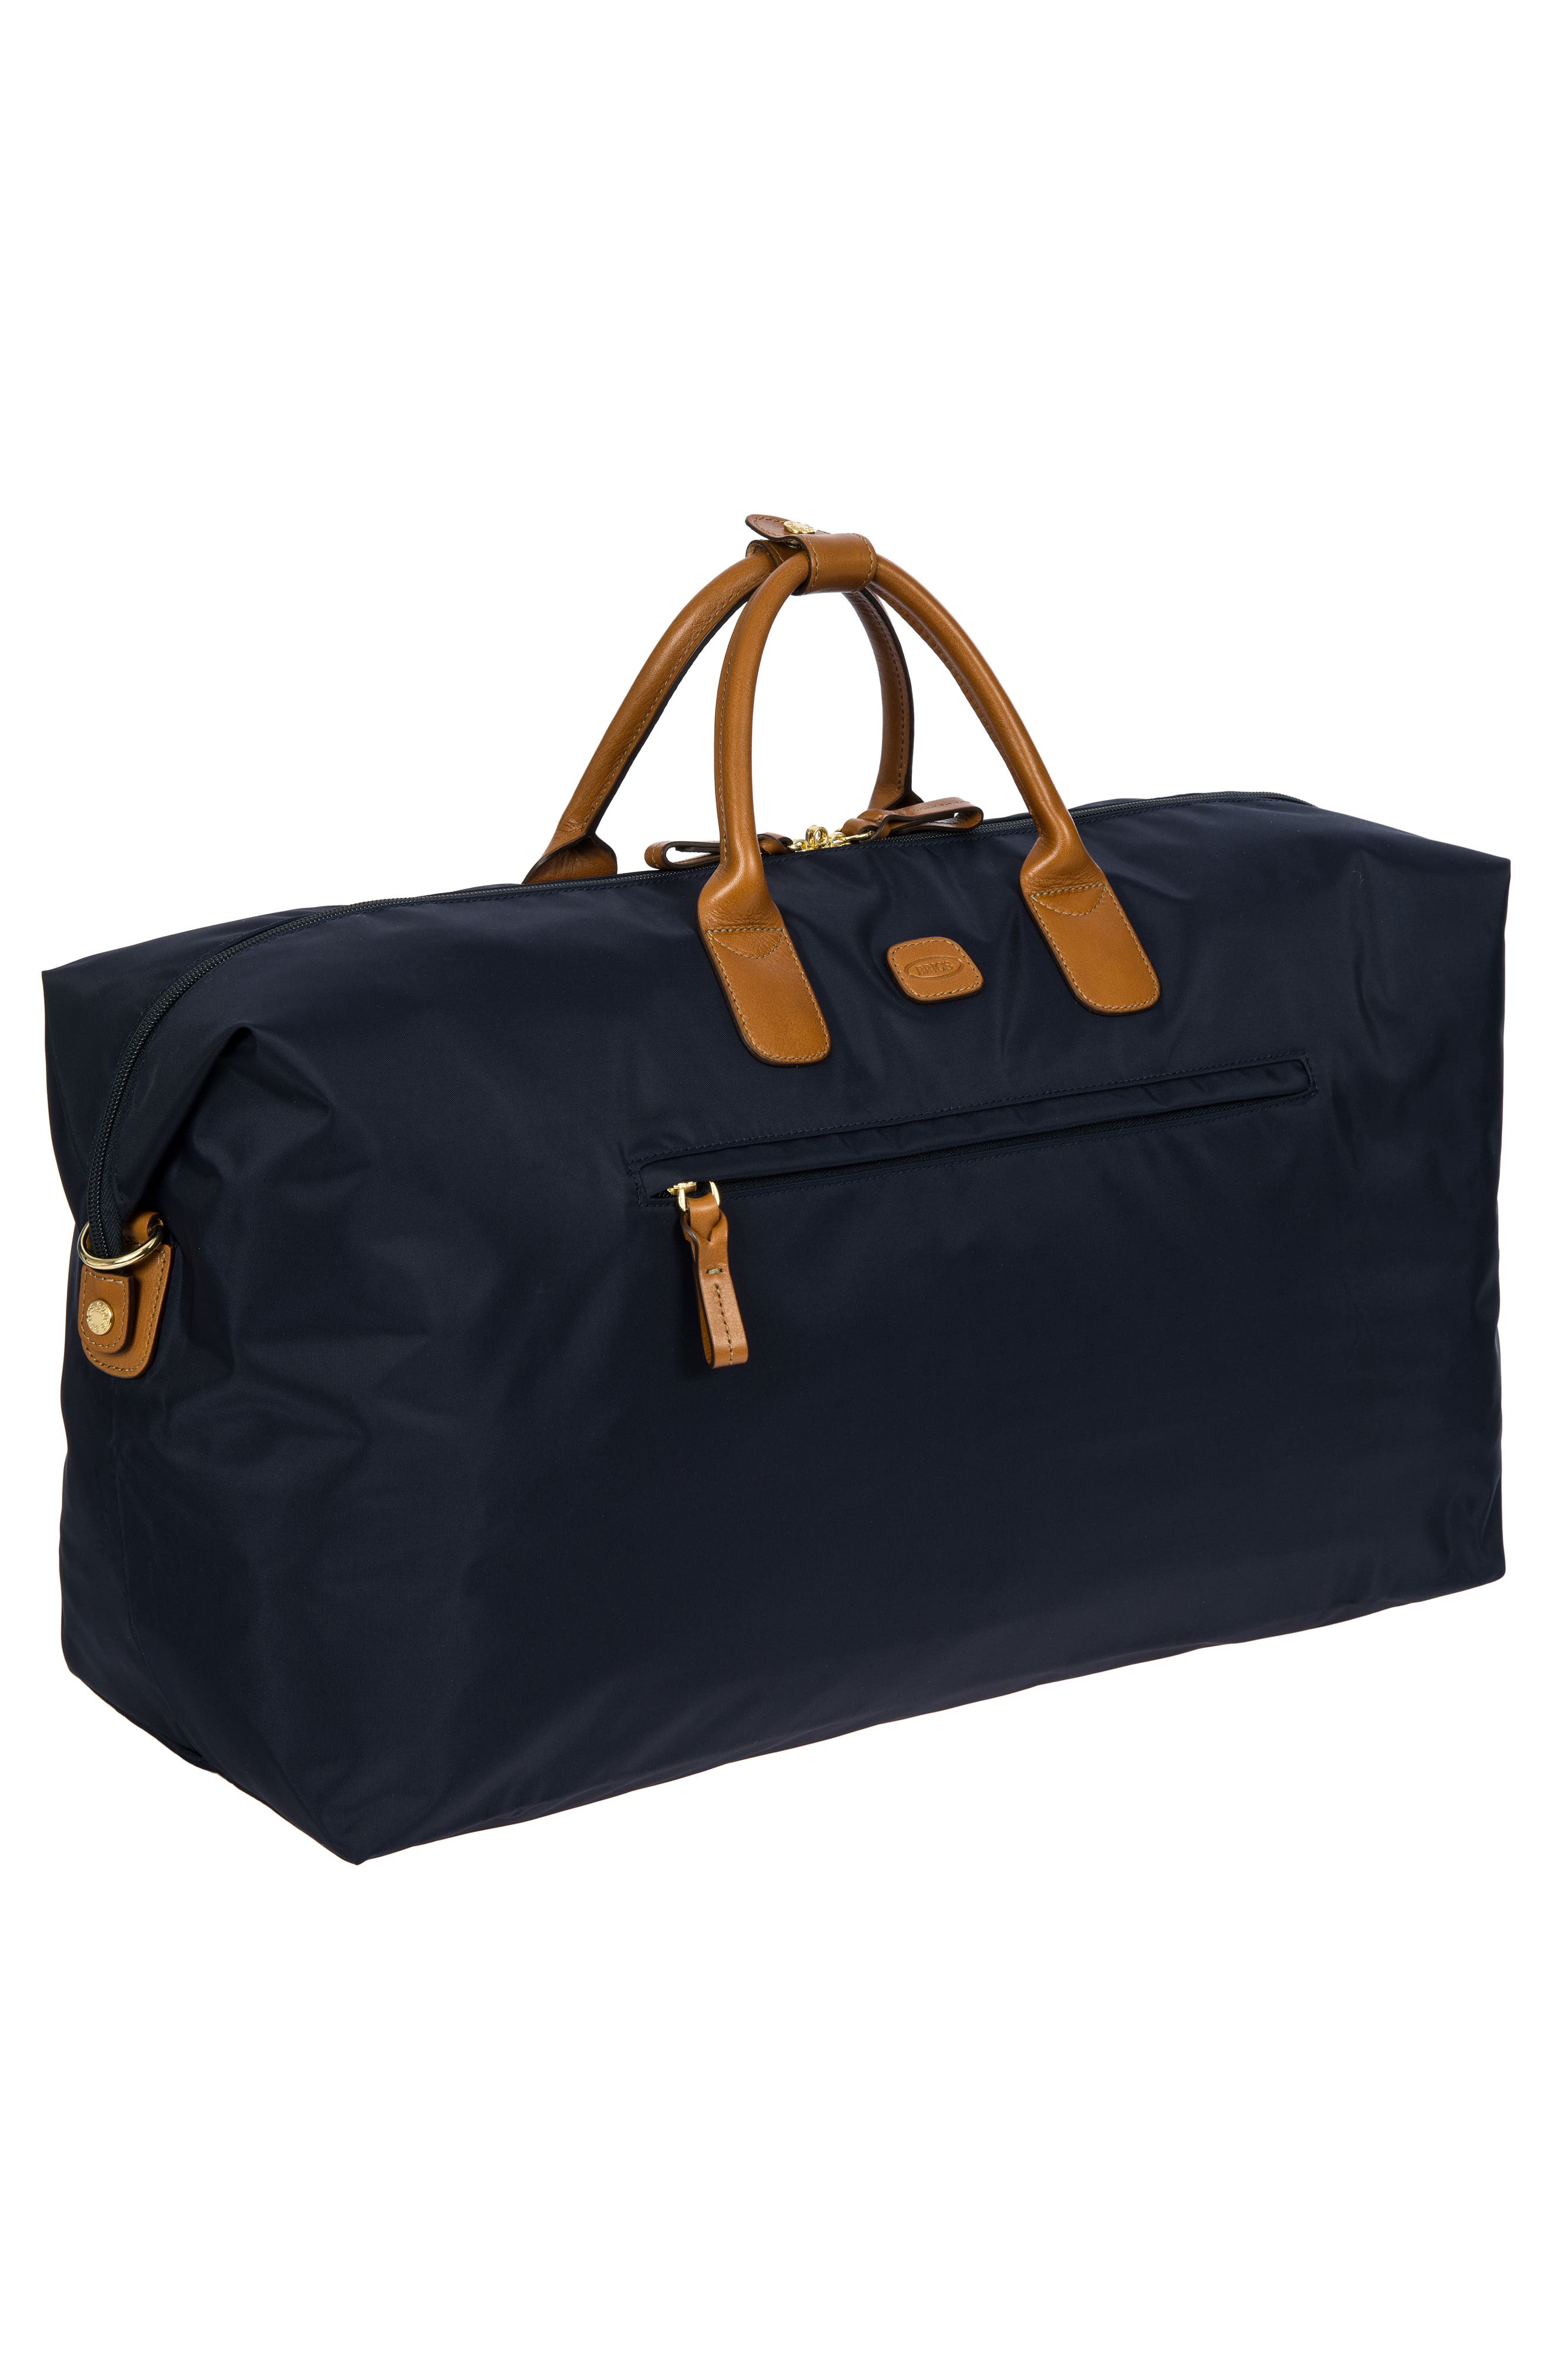 X-Bag Boarding 22-Inch Duffel Bag,                             Alternate thumbnail 4, color,                             NAVY